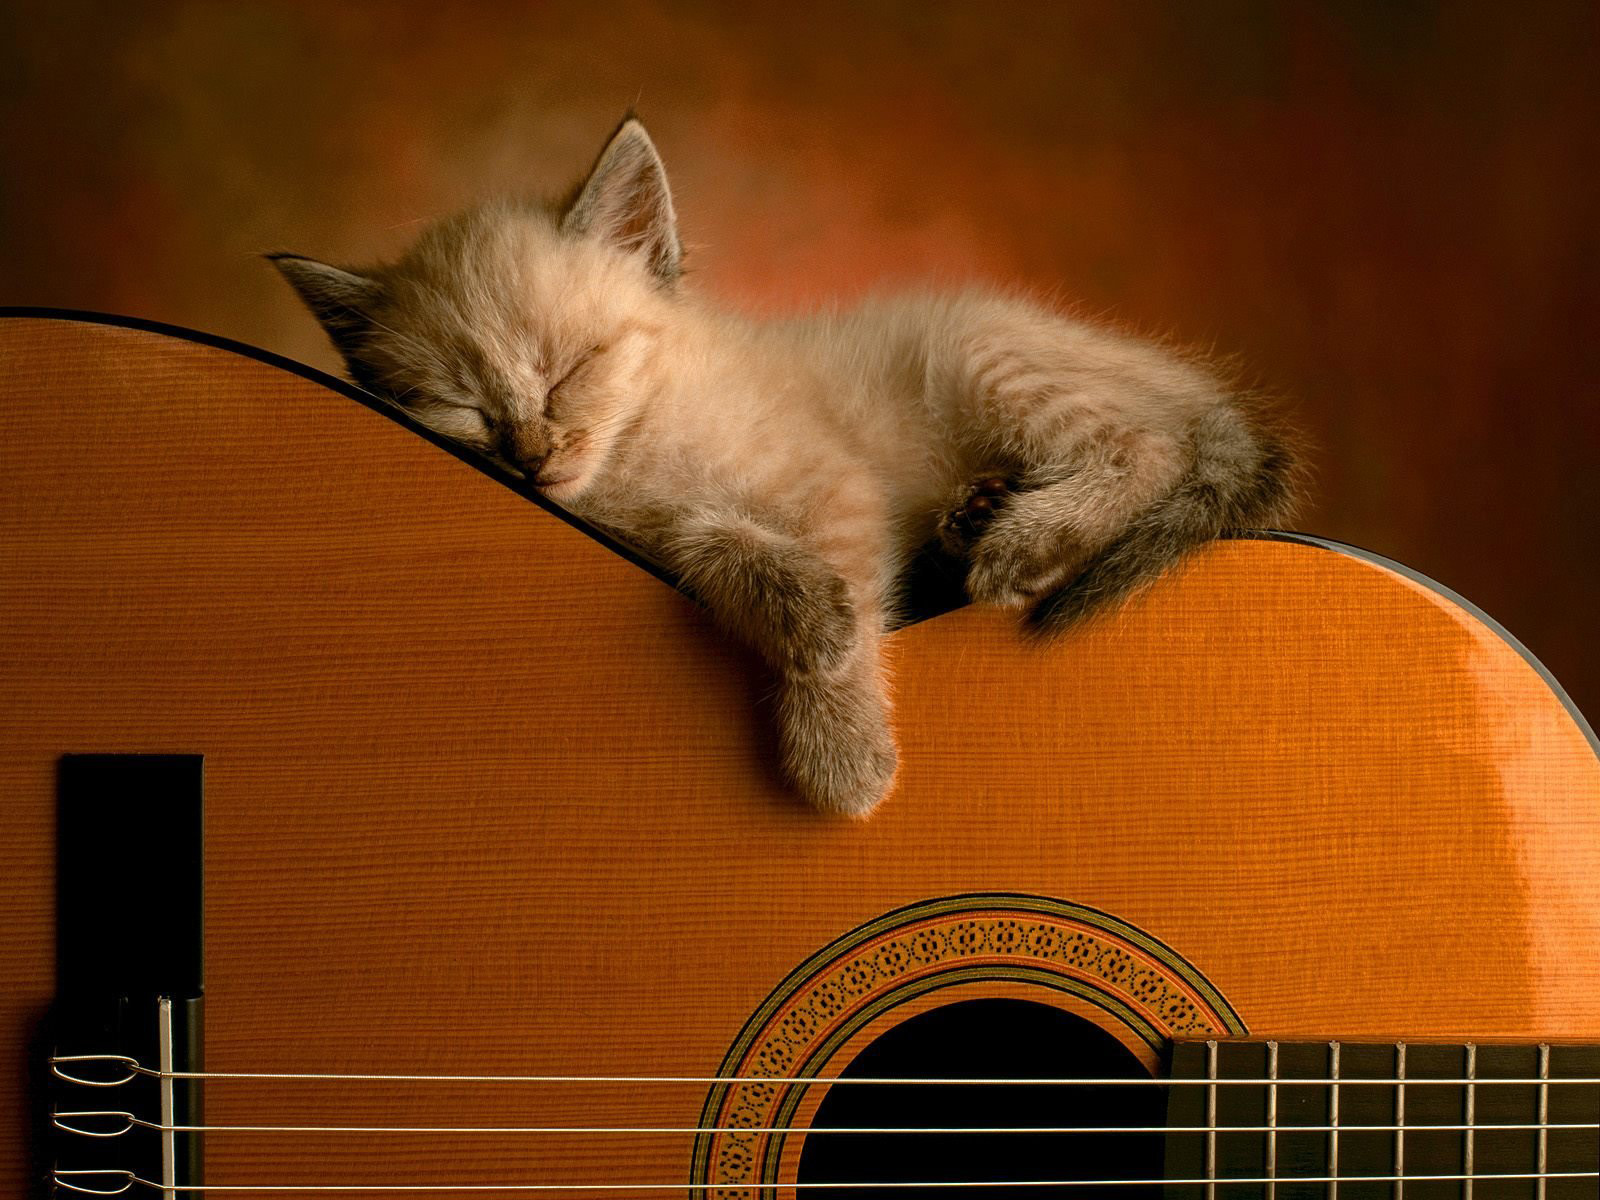 Guitar_0031.jpg